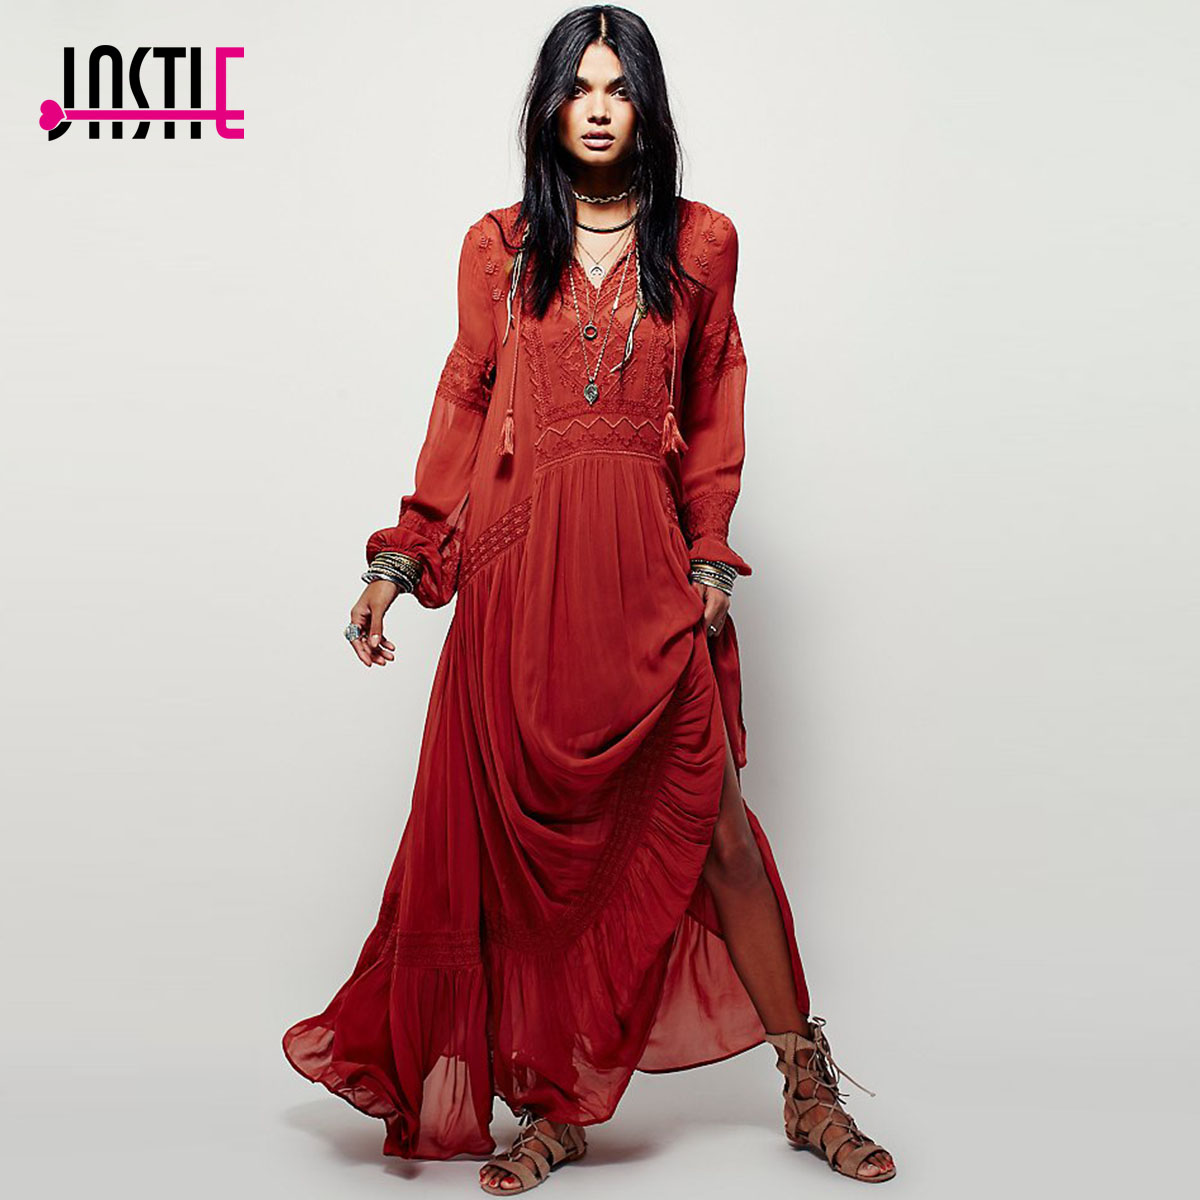 Jastie mujeres Vestidos elegantes señoras Vintage manga larga bordado naranja rojo Maxi vestido Vestidos femeninos estilo bohemio 2017-in Vestidos from Ropa de mujer    1